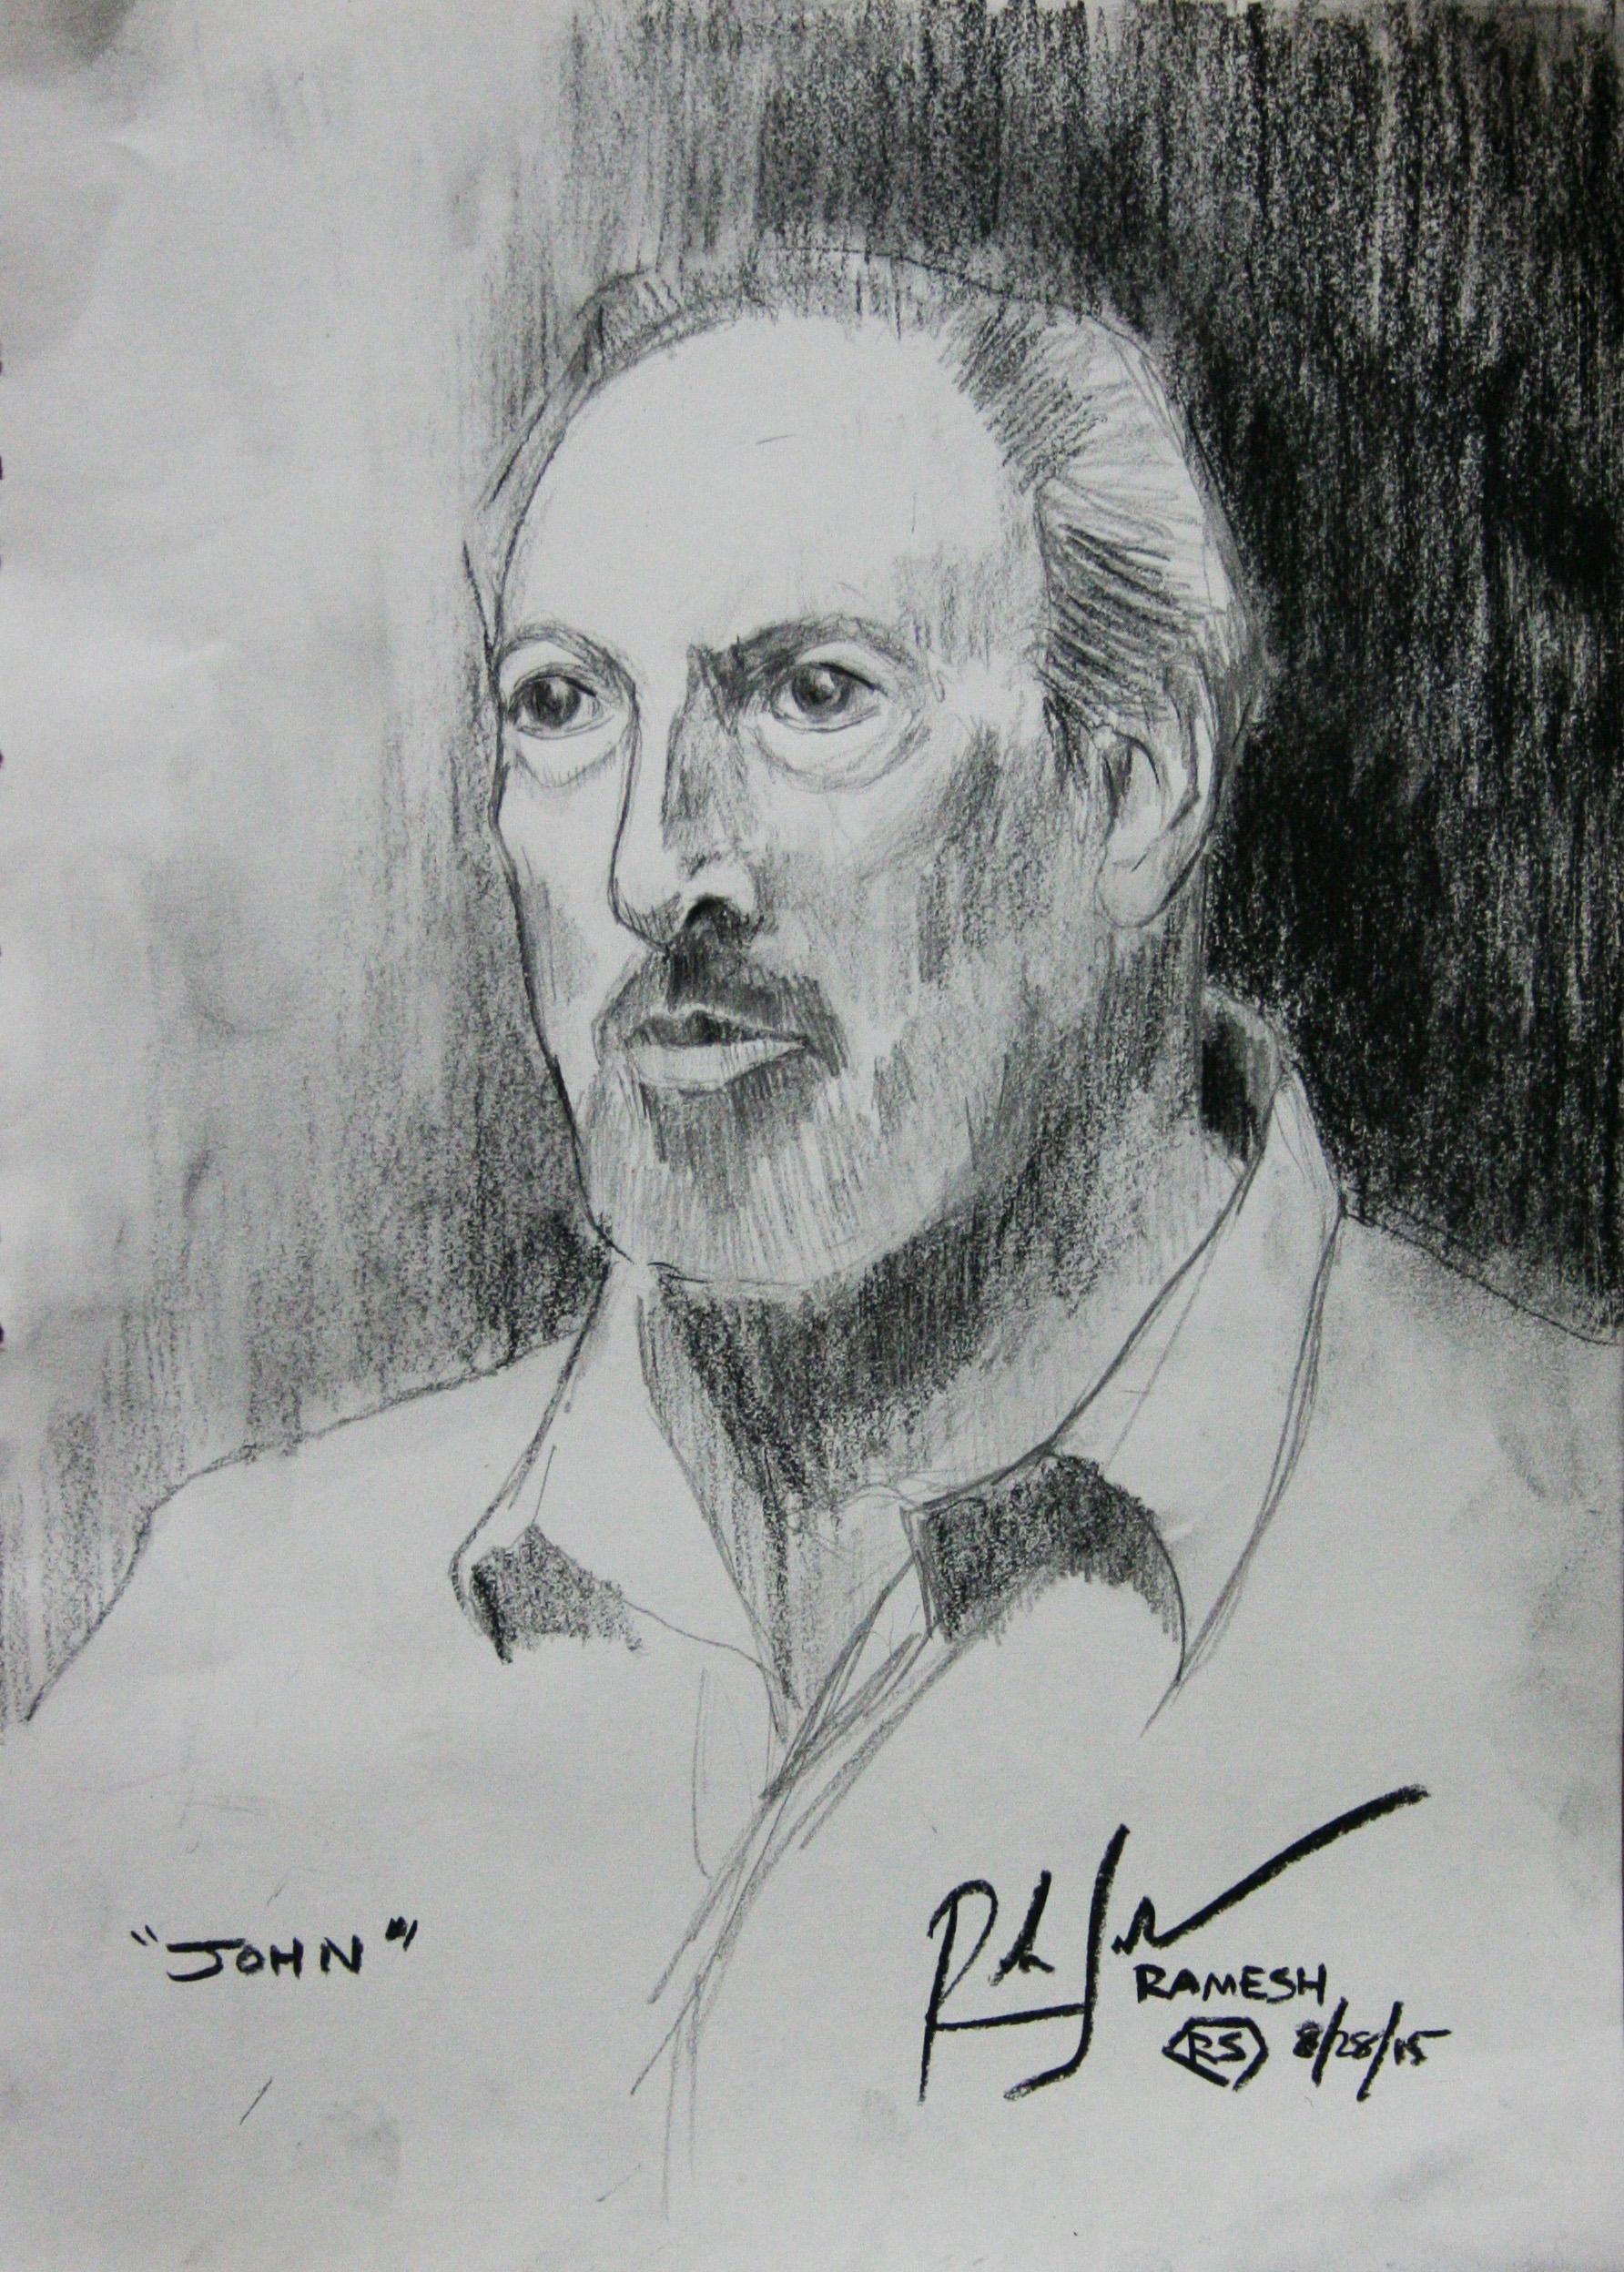 Ramesh Subramanium did this hour drawing.